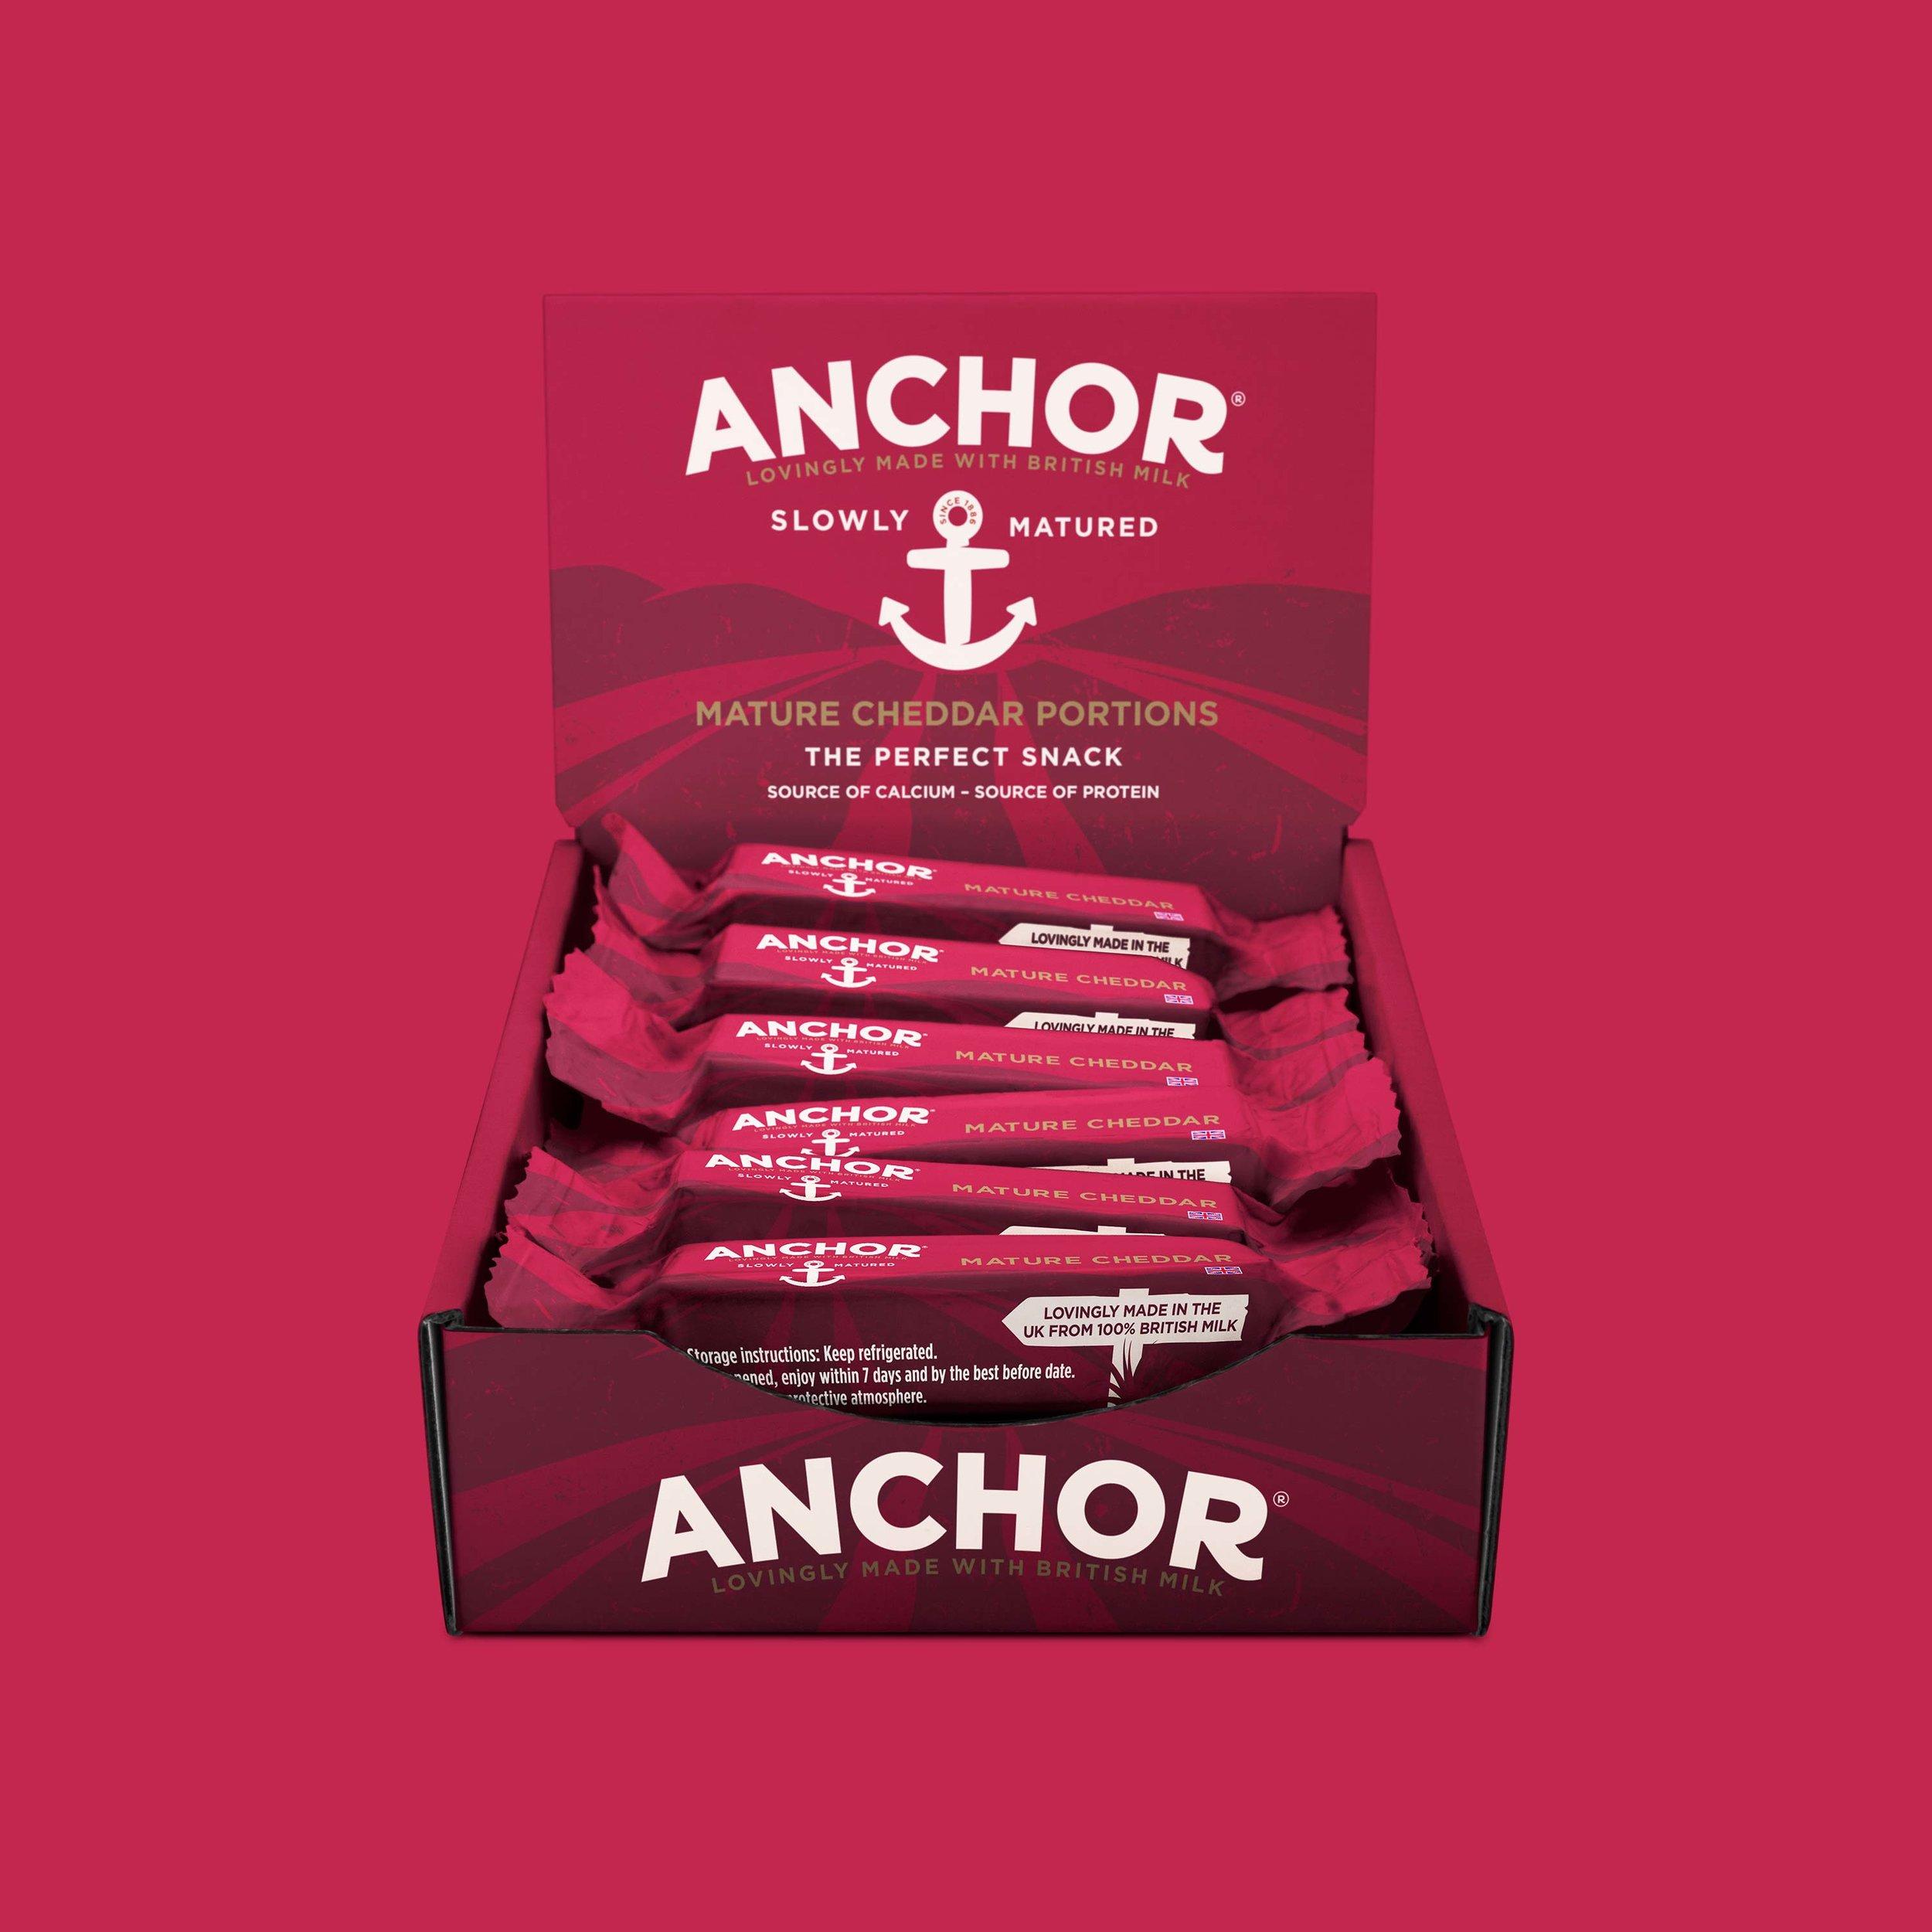 Arla-Anchor-Mature-Cheddar-Portions-SRP-Food-Packaging-Packaging-Prototype-Design.jpg